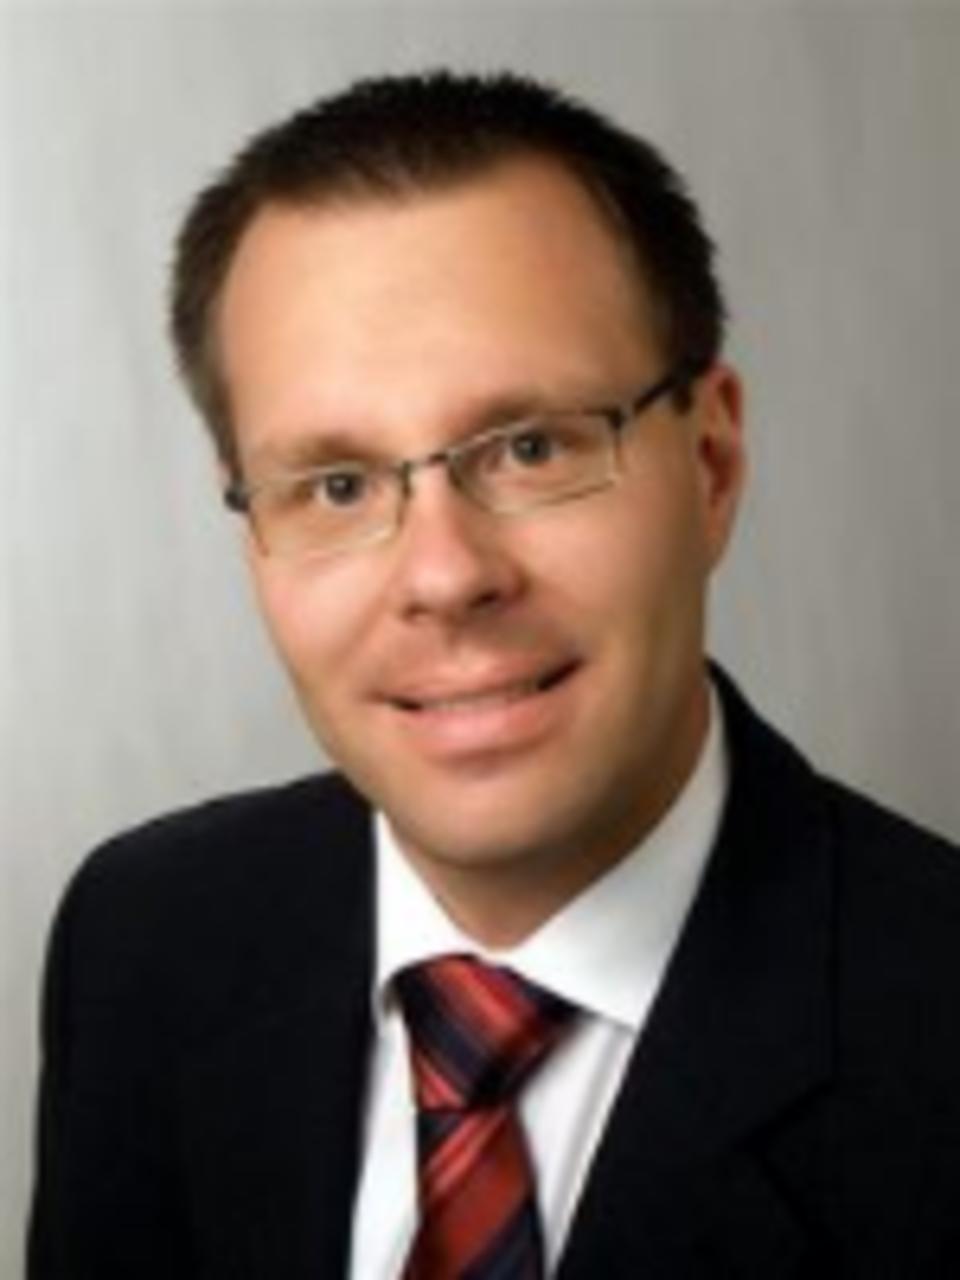 Stefan Akamp